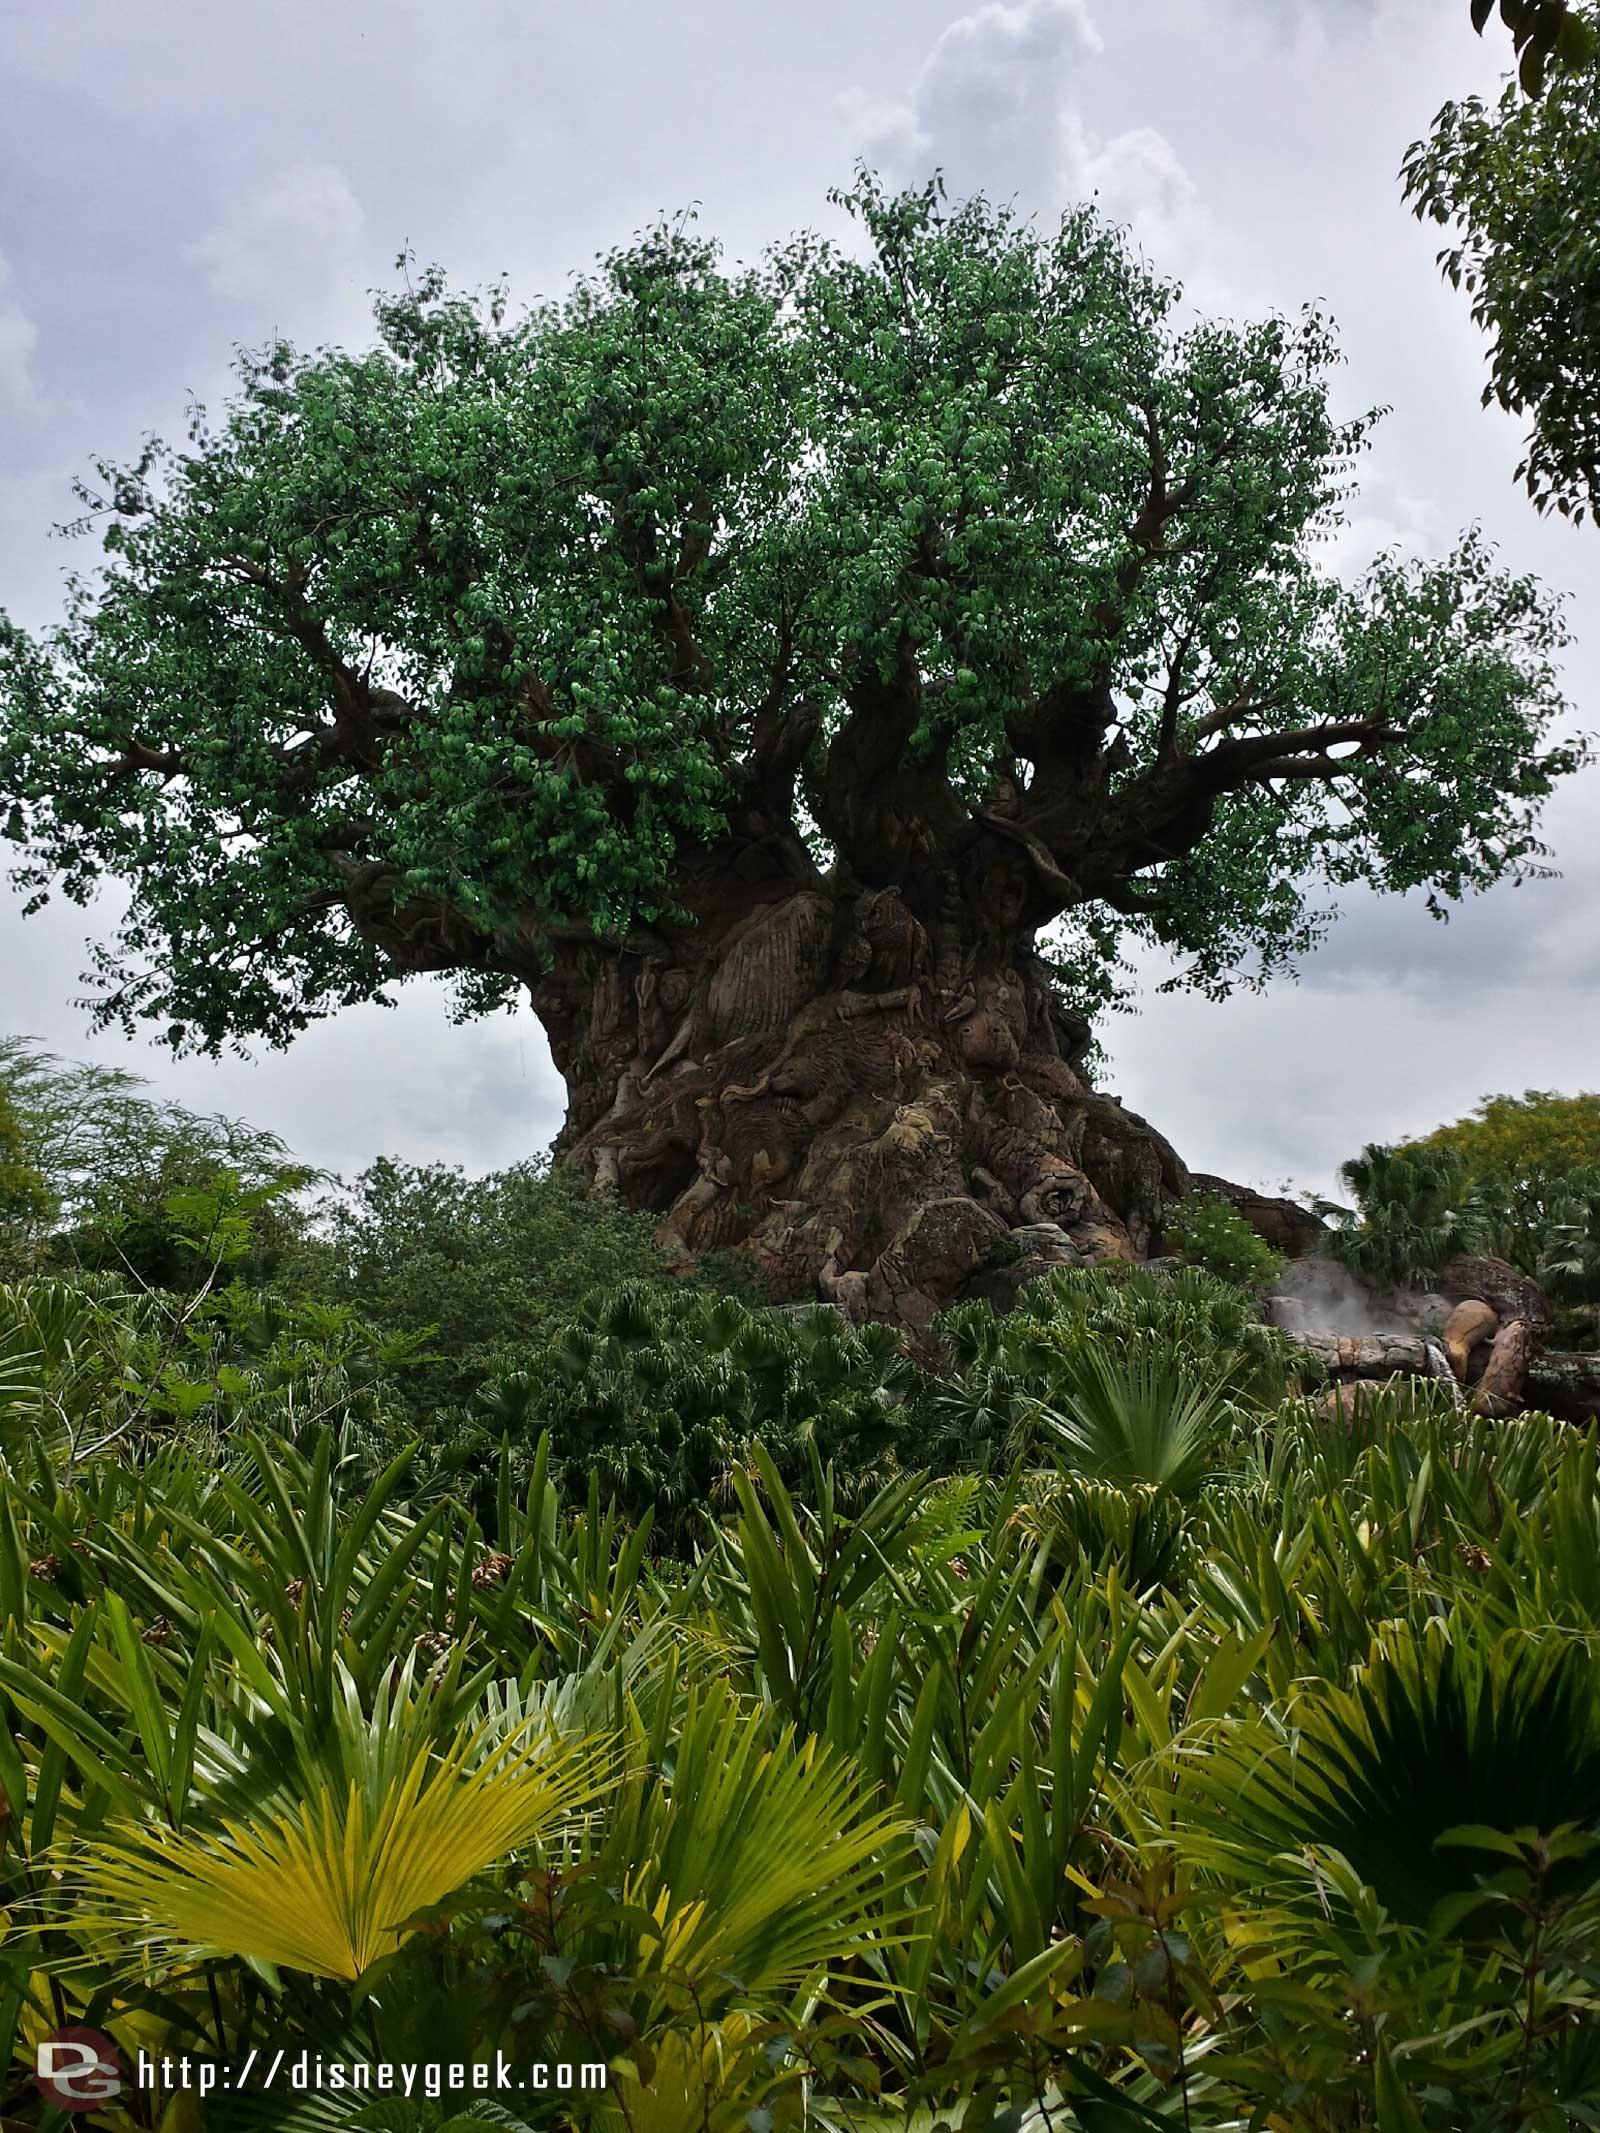 The Tree of Life – Disney's Animal Kingdom